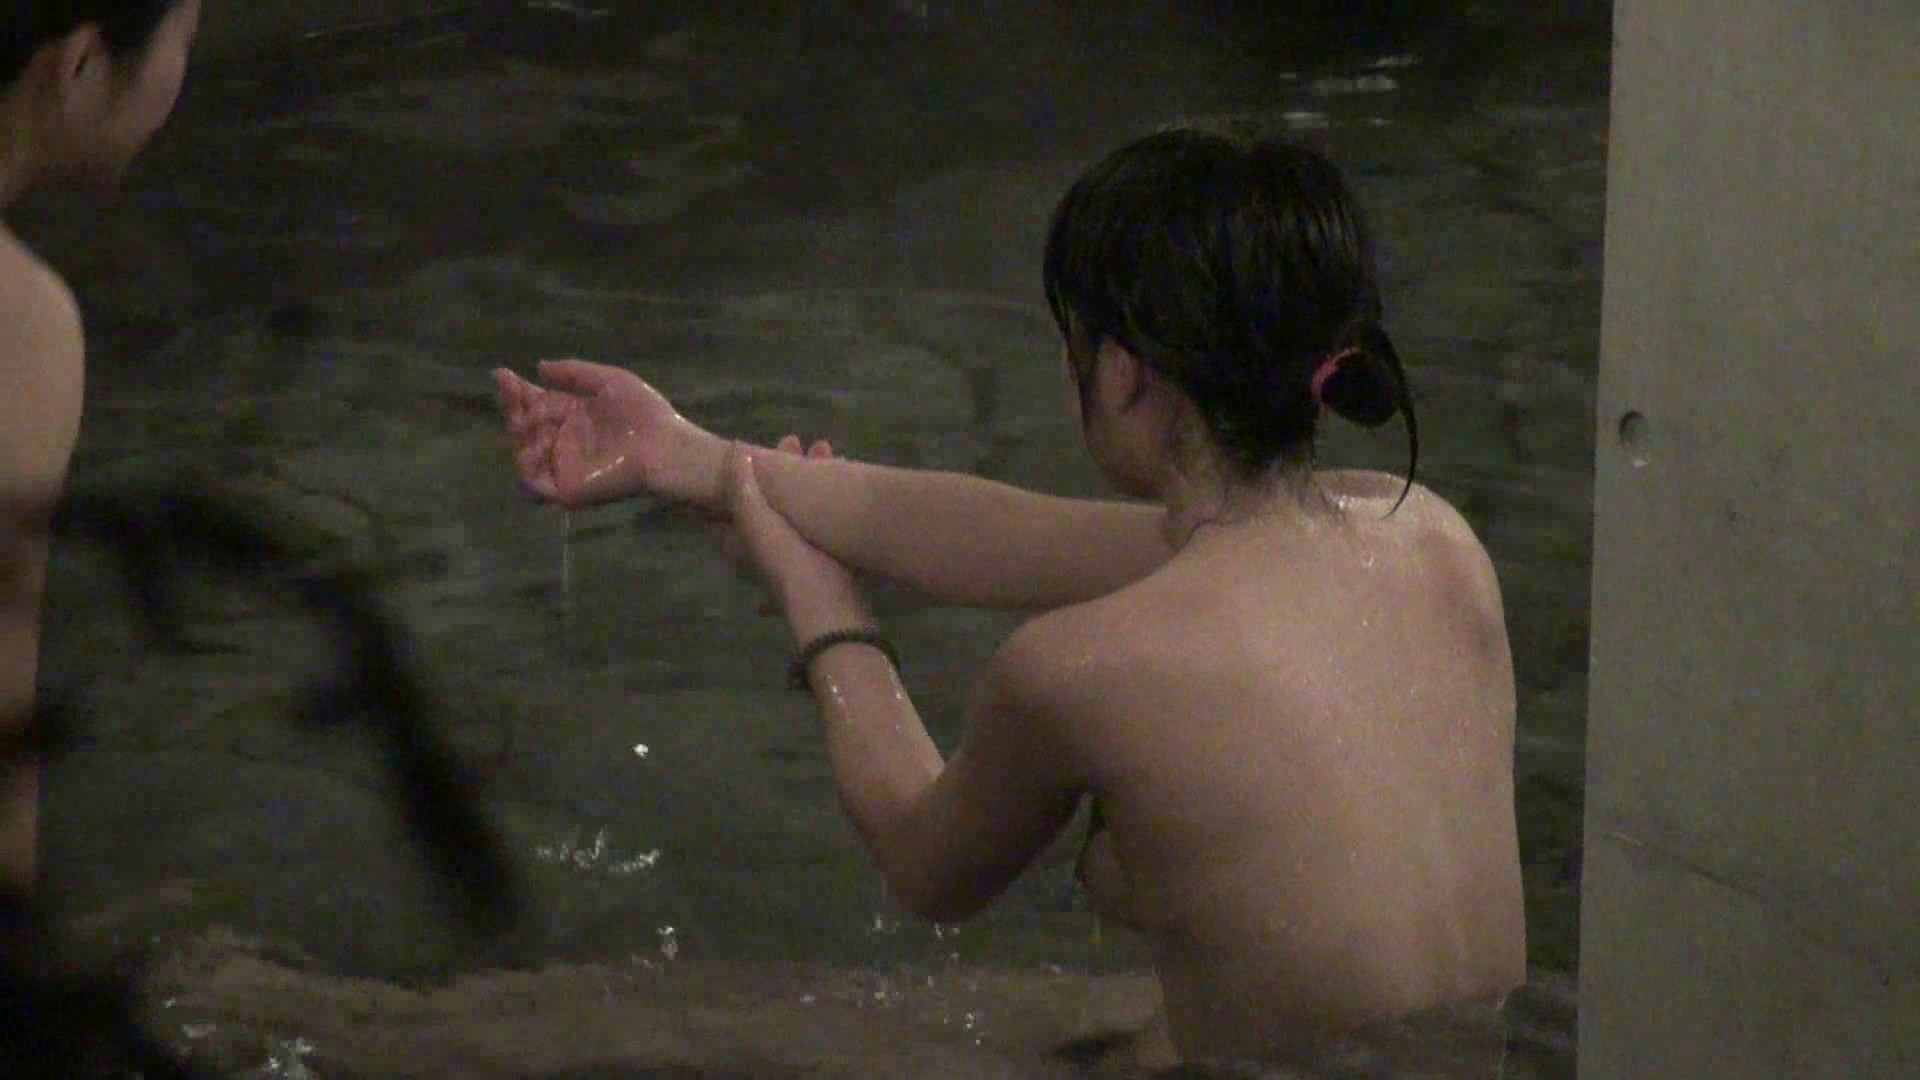 Aquaな露天風呂Vol.343 0   0  83連発 9